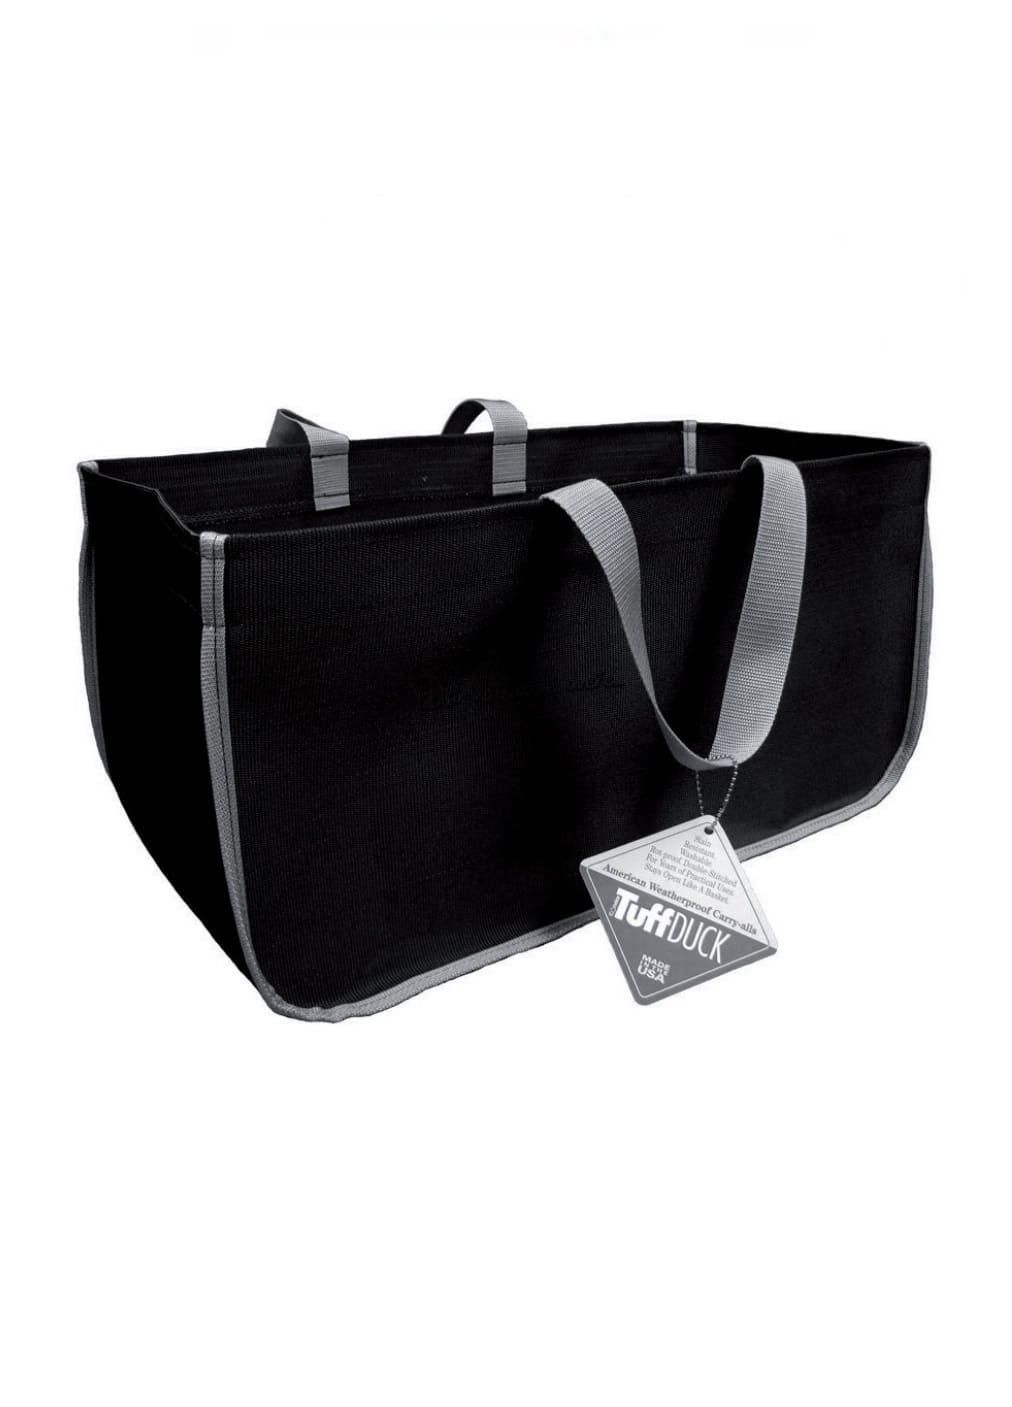 Дровница, сумка 21.02.677.2